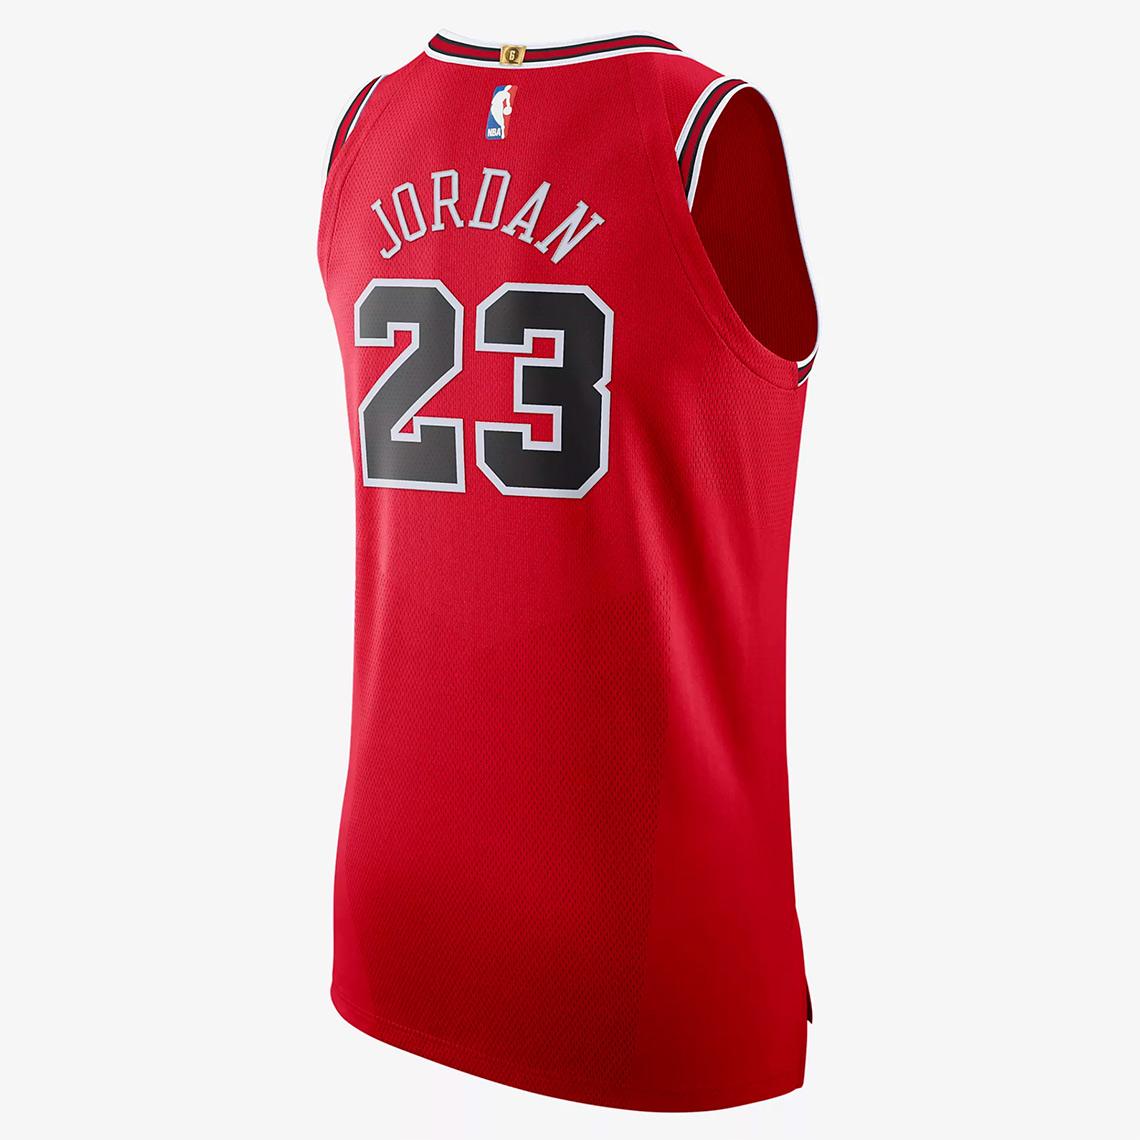 best sneakers ccf2c 7551a NikeConnect Michael Jordan Authentic Bulls Jersey Release ...